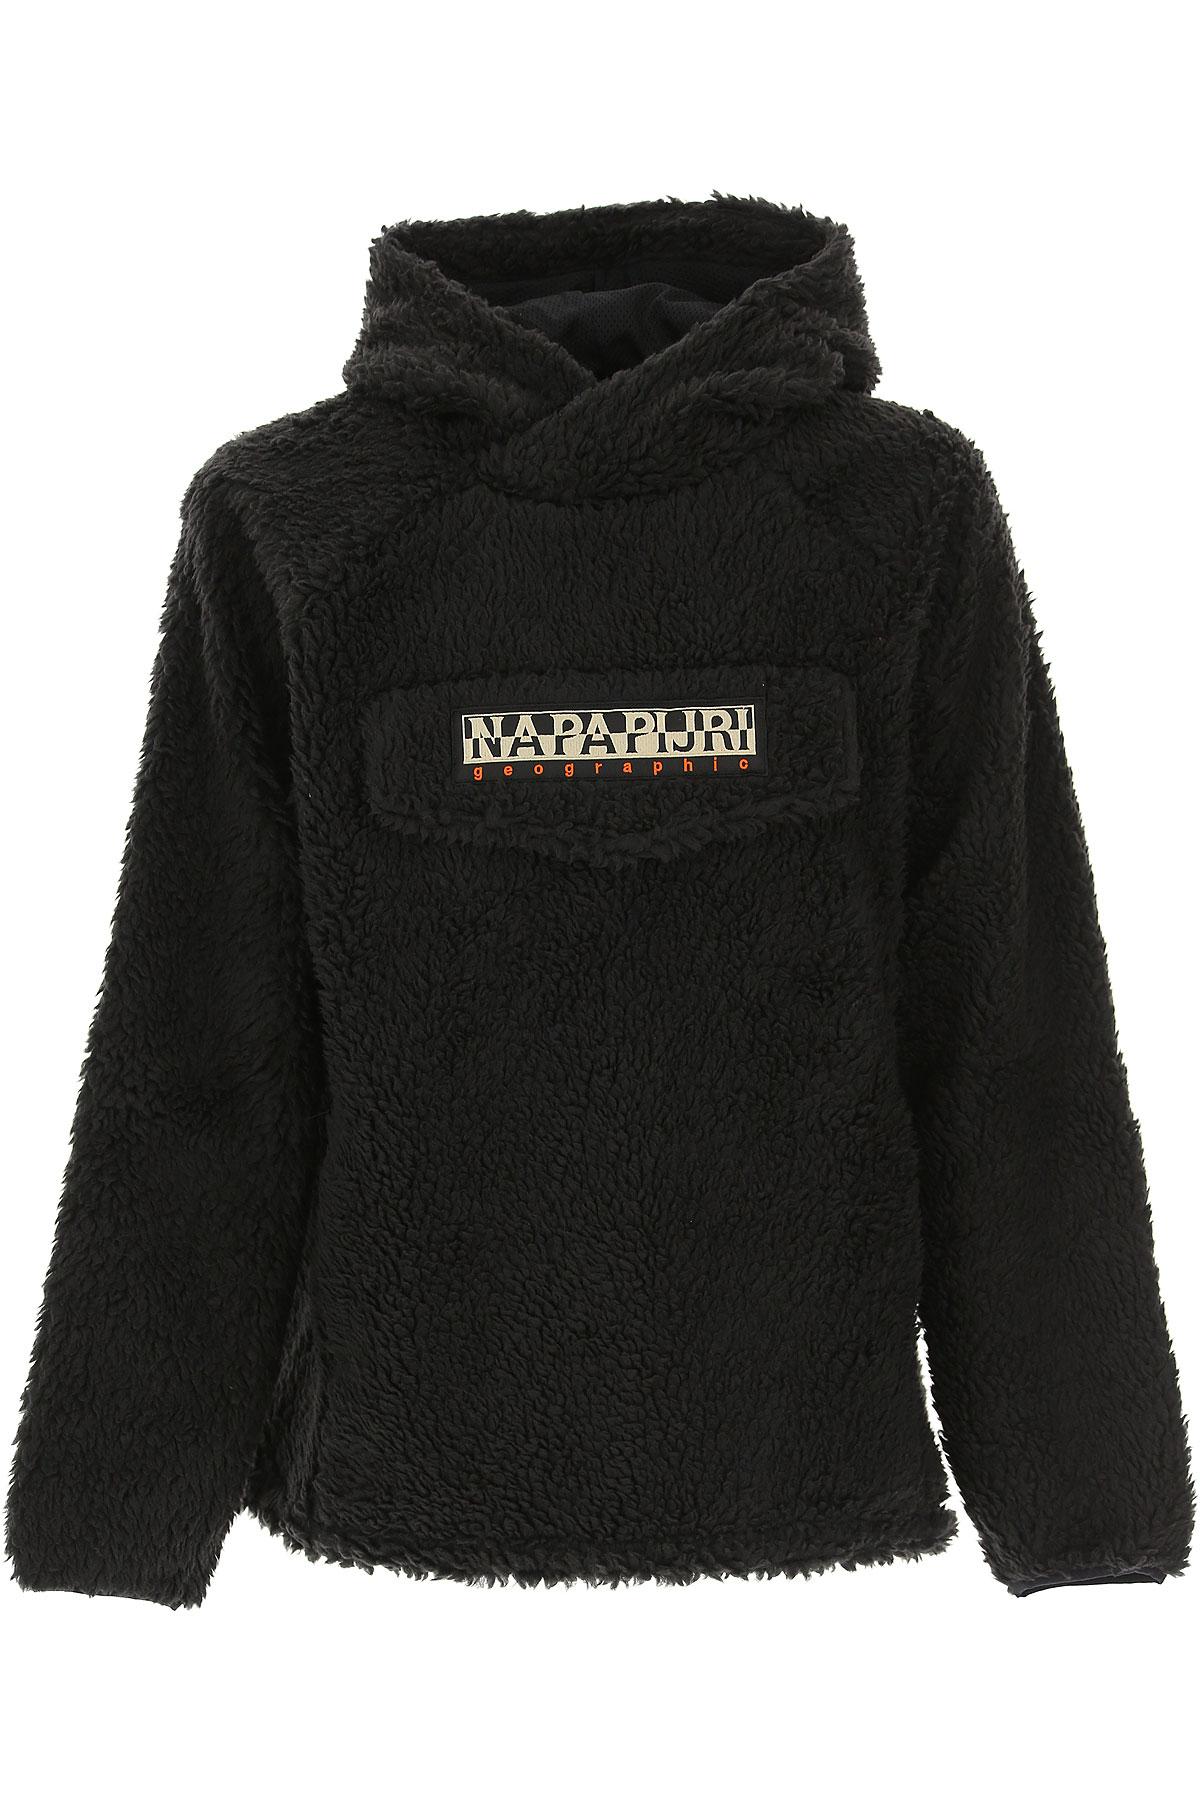 Image of Napapijri Down Jacket for Men, Puffer Ski Jacket, Black, polyester, 2017, L M S XL XXL